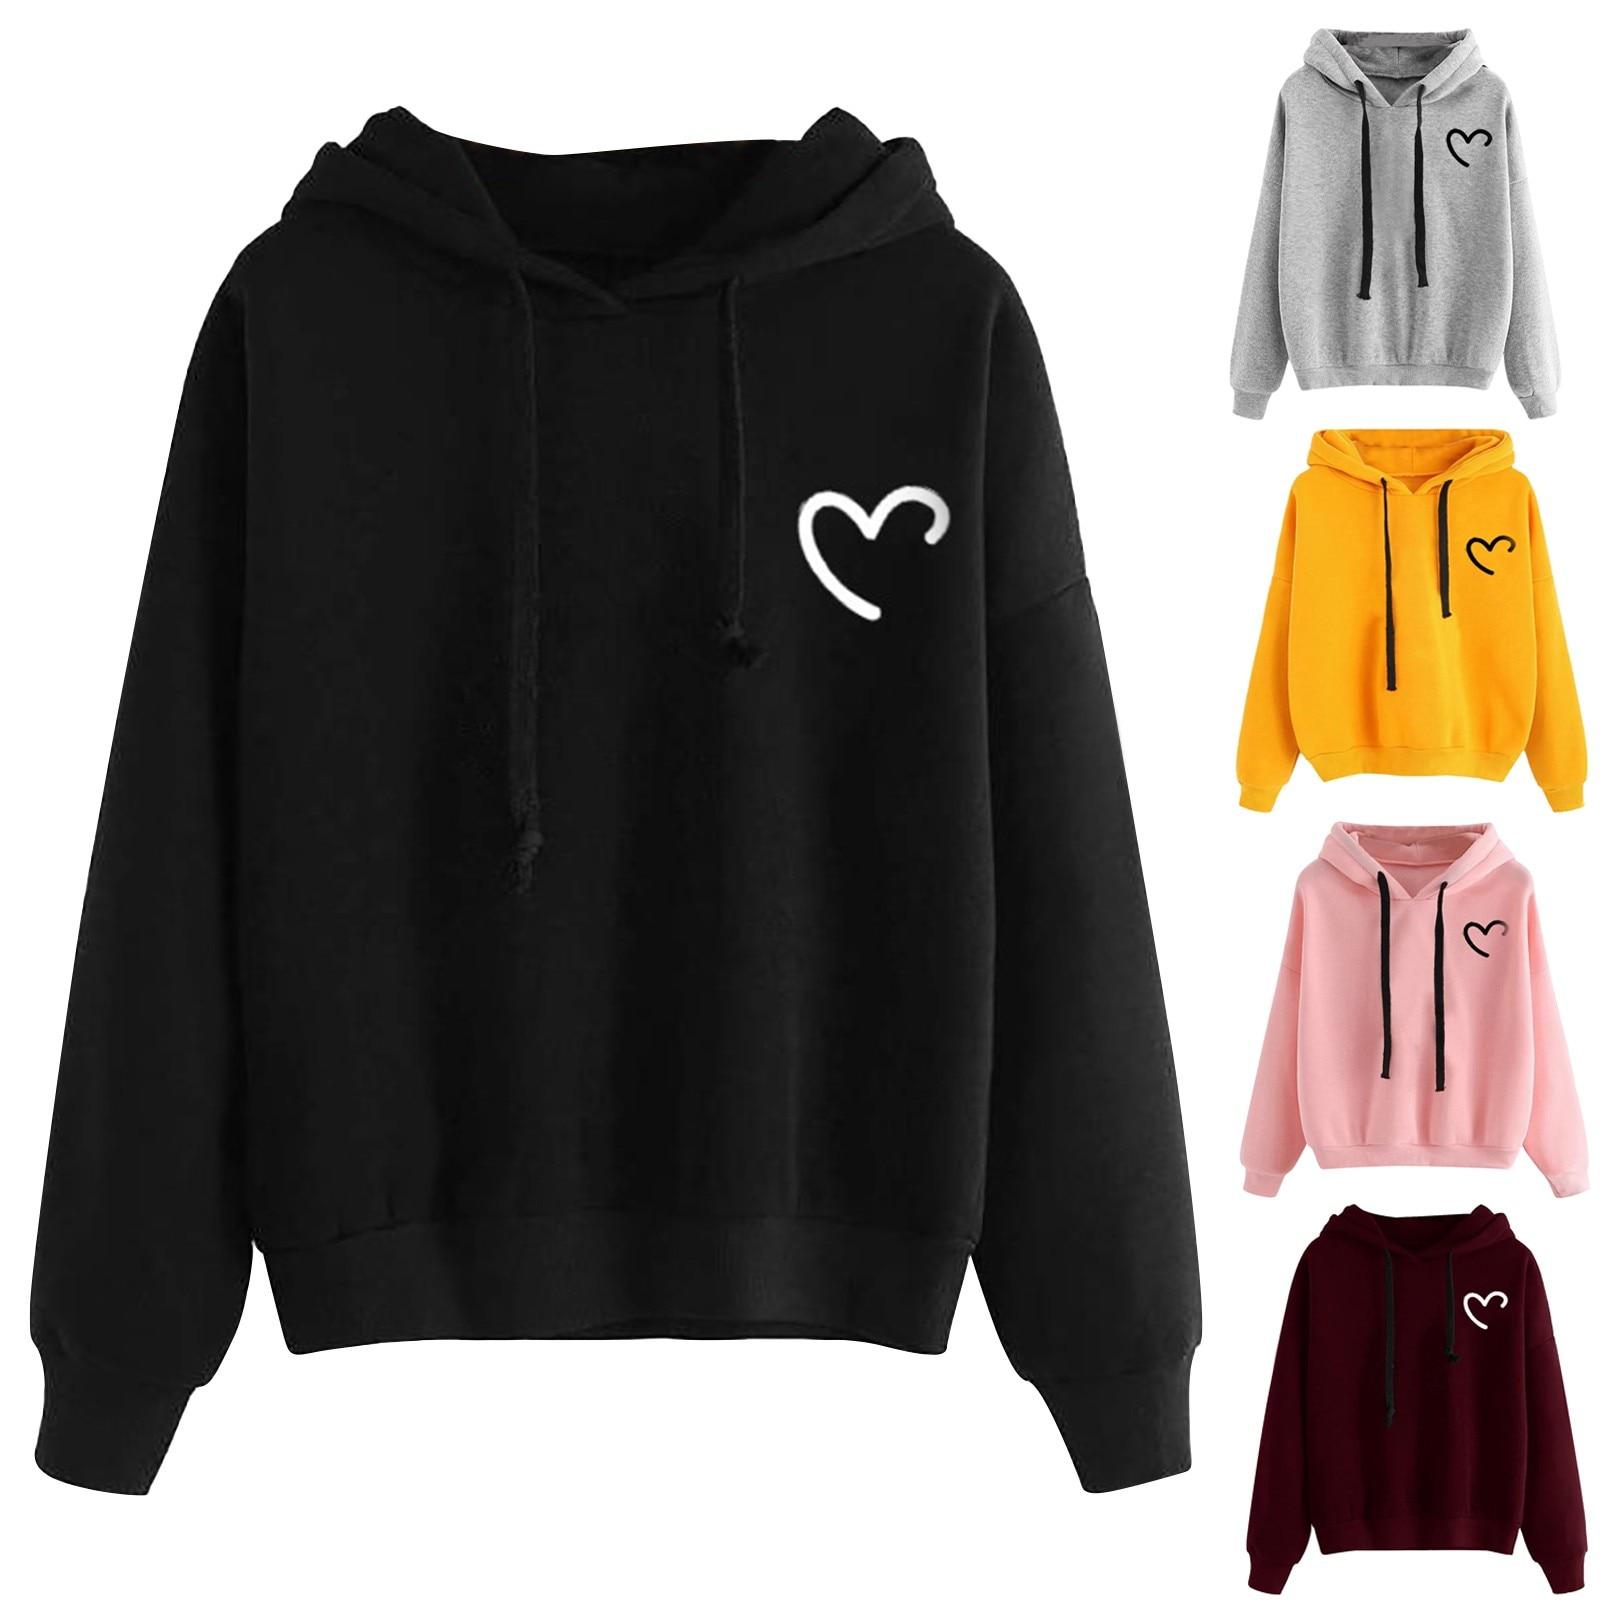 Clothing women 2020 Brand Female Long SleeveLove printing Hooded Толстовка Hoodie Tracksuit